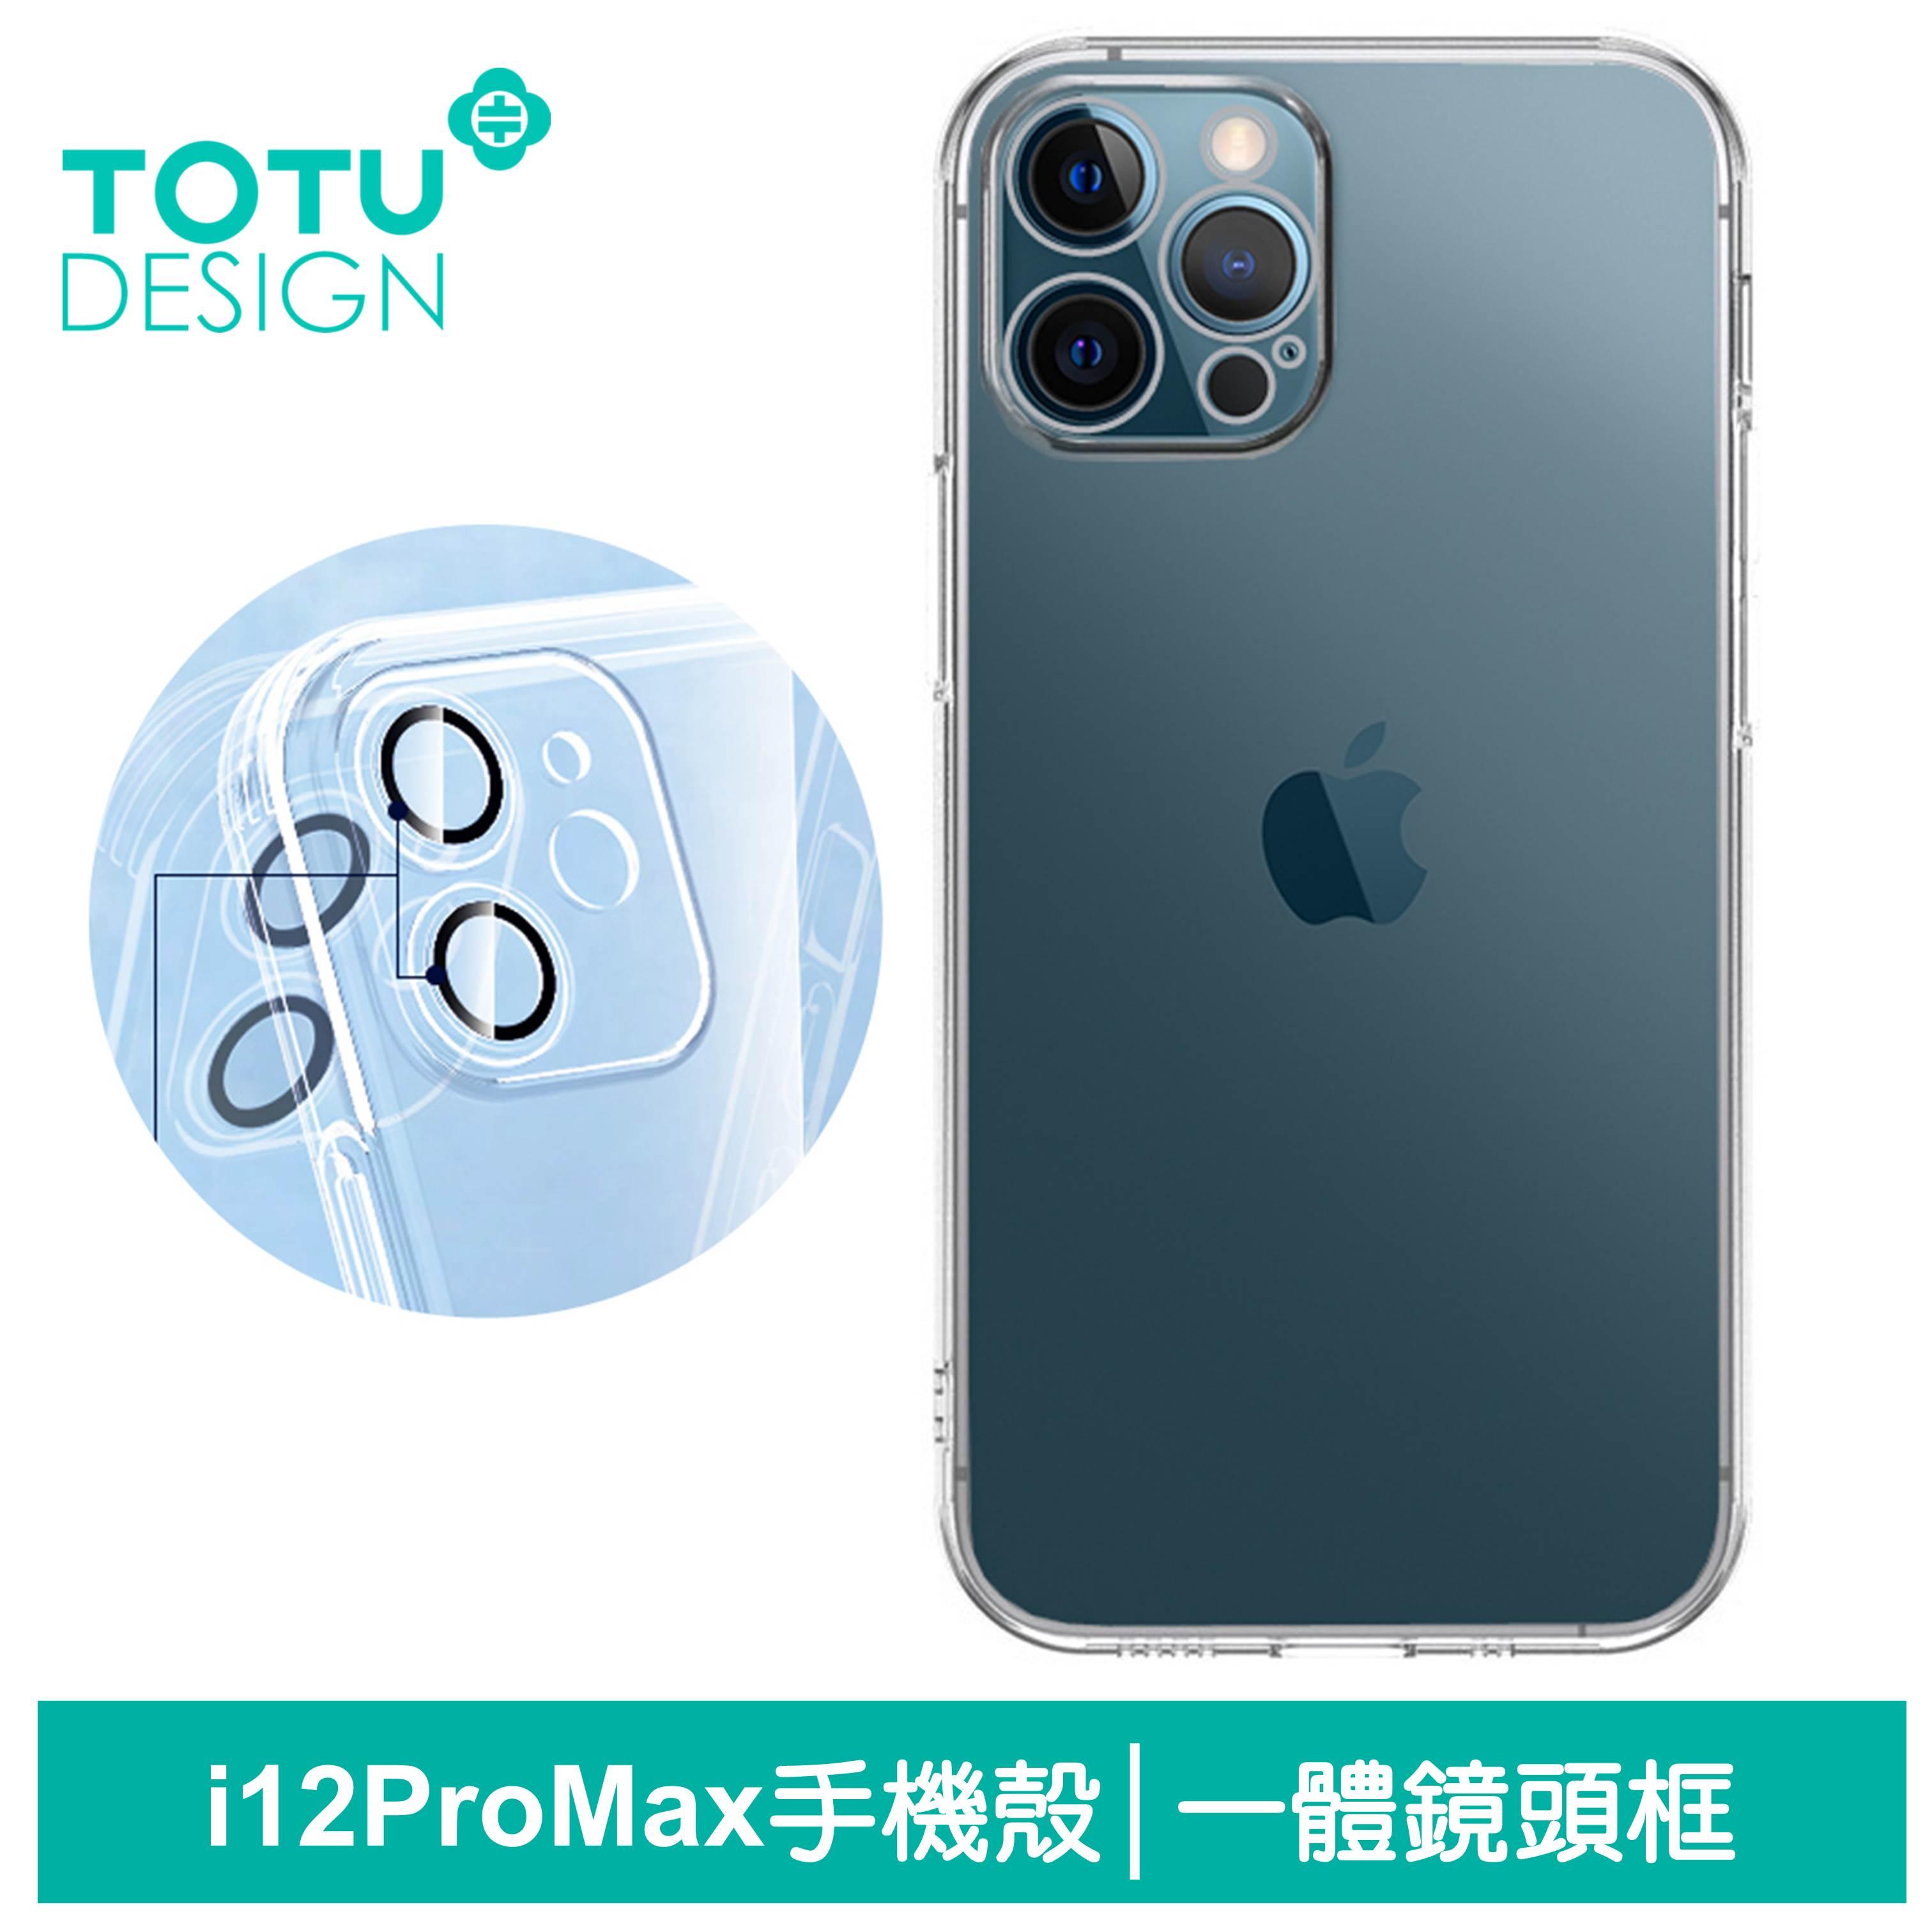 TOTU台灣官方 iPhone 12 Pro Max 手機殼 i12 Pro Max 保護殼 6.7吋 防摔殼 軟殼 一體鏡頭框 柔精裝 透明